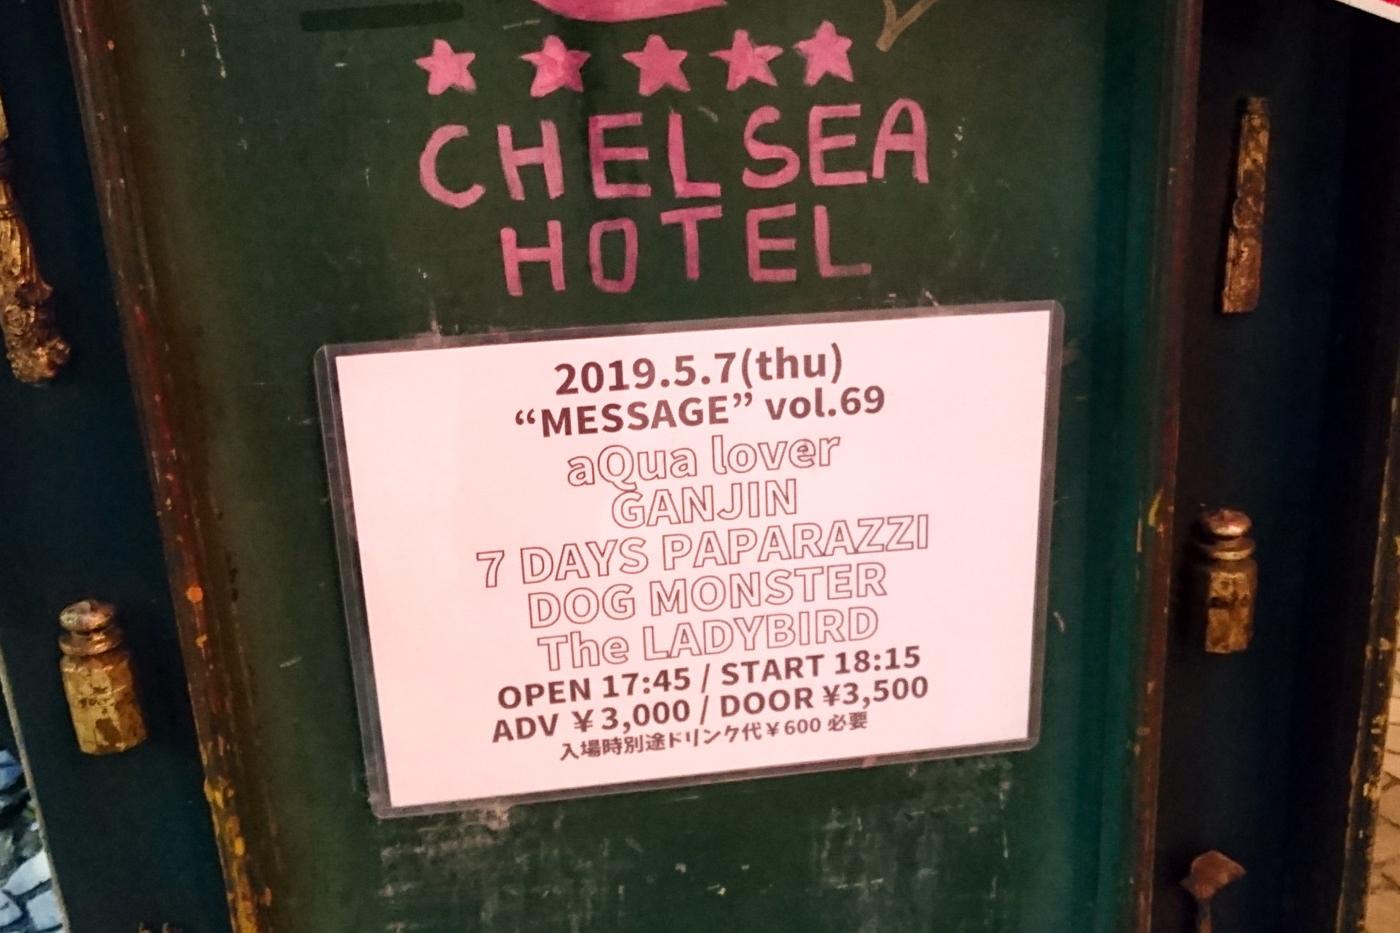 「MESSAGE」vol.69@渋谷 CHELSEA HOTEL